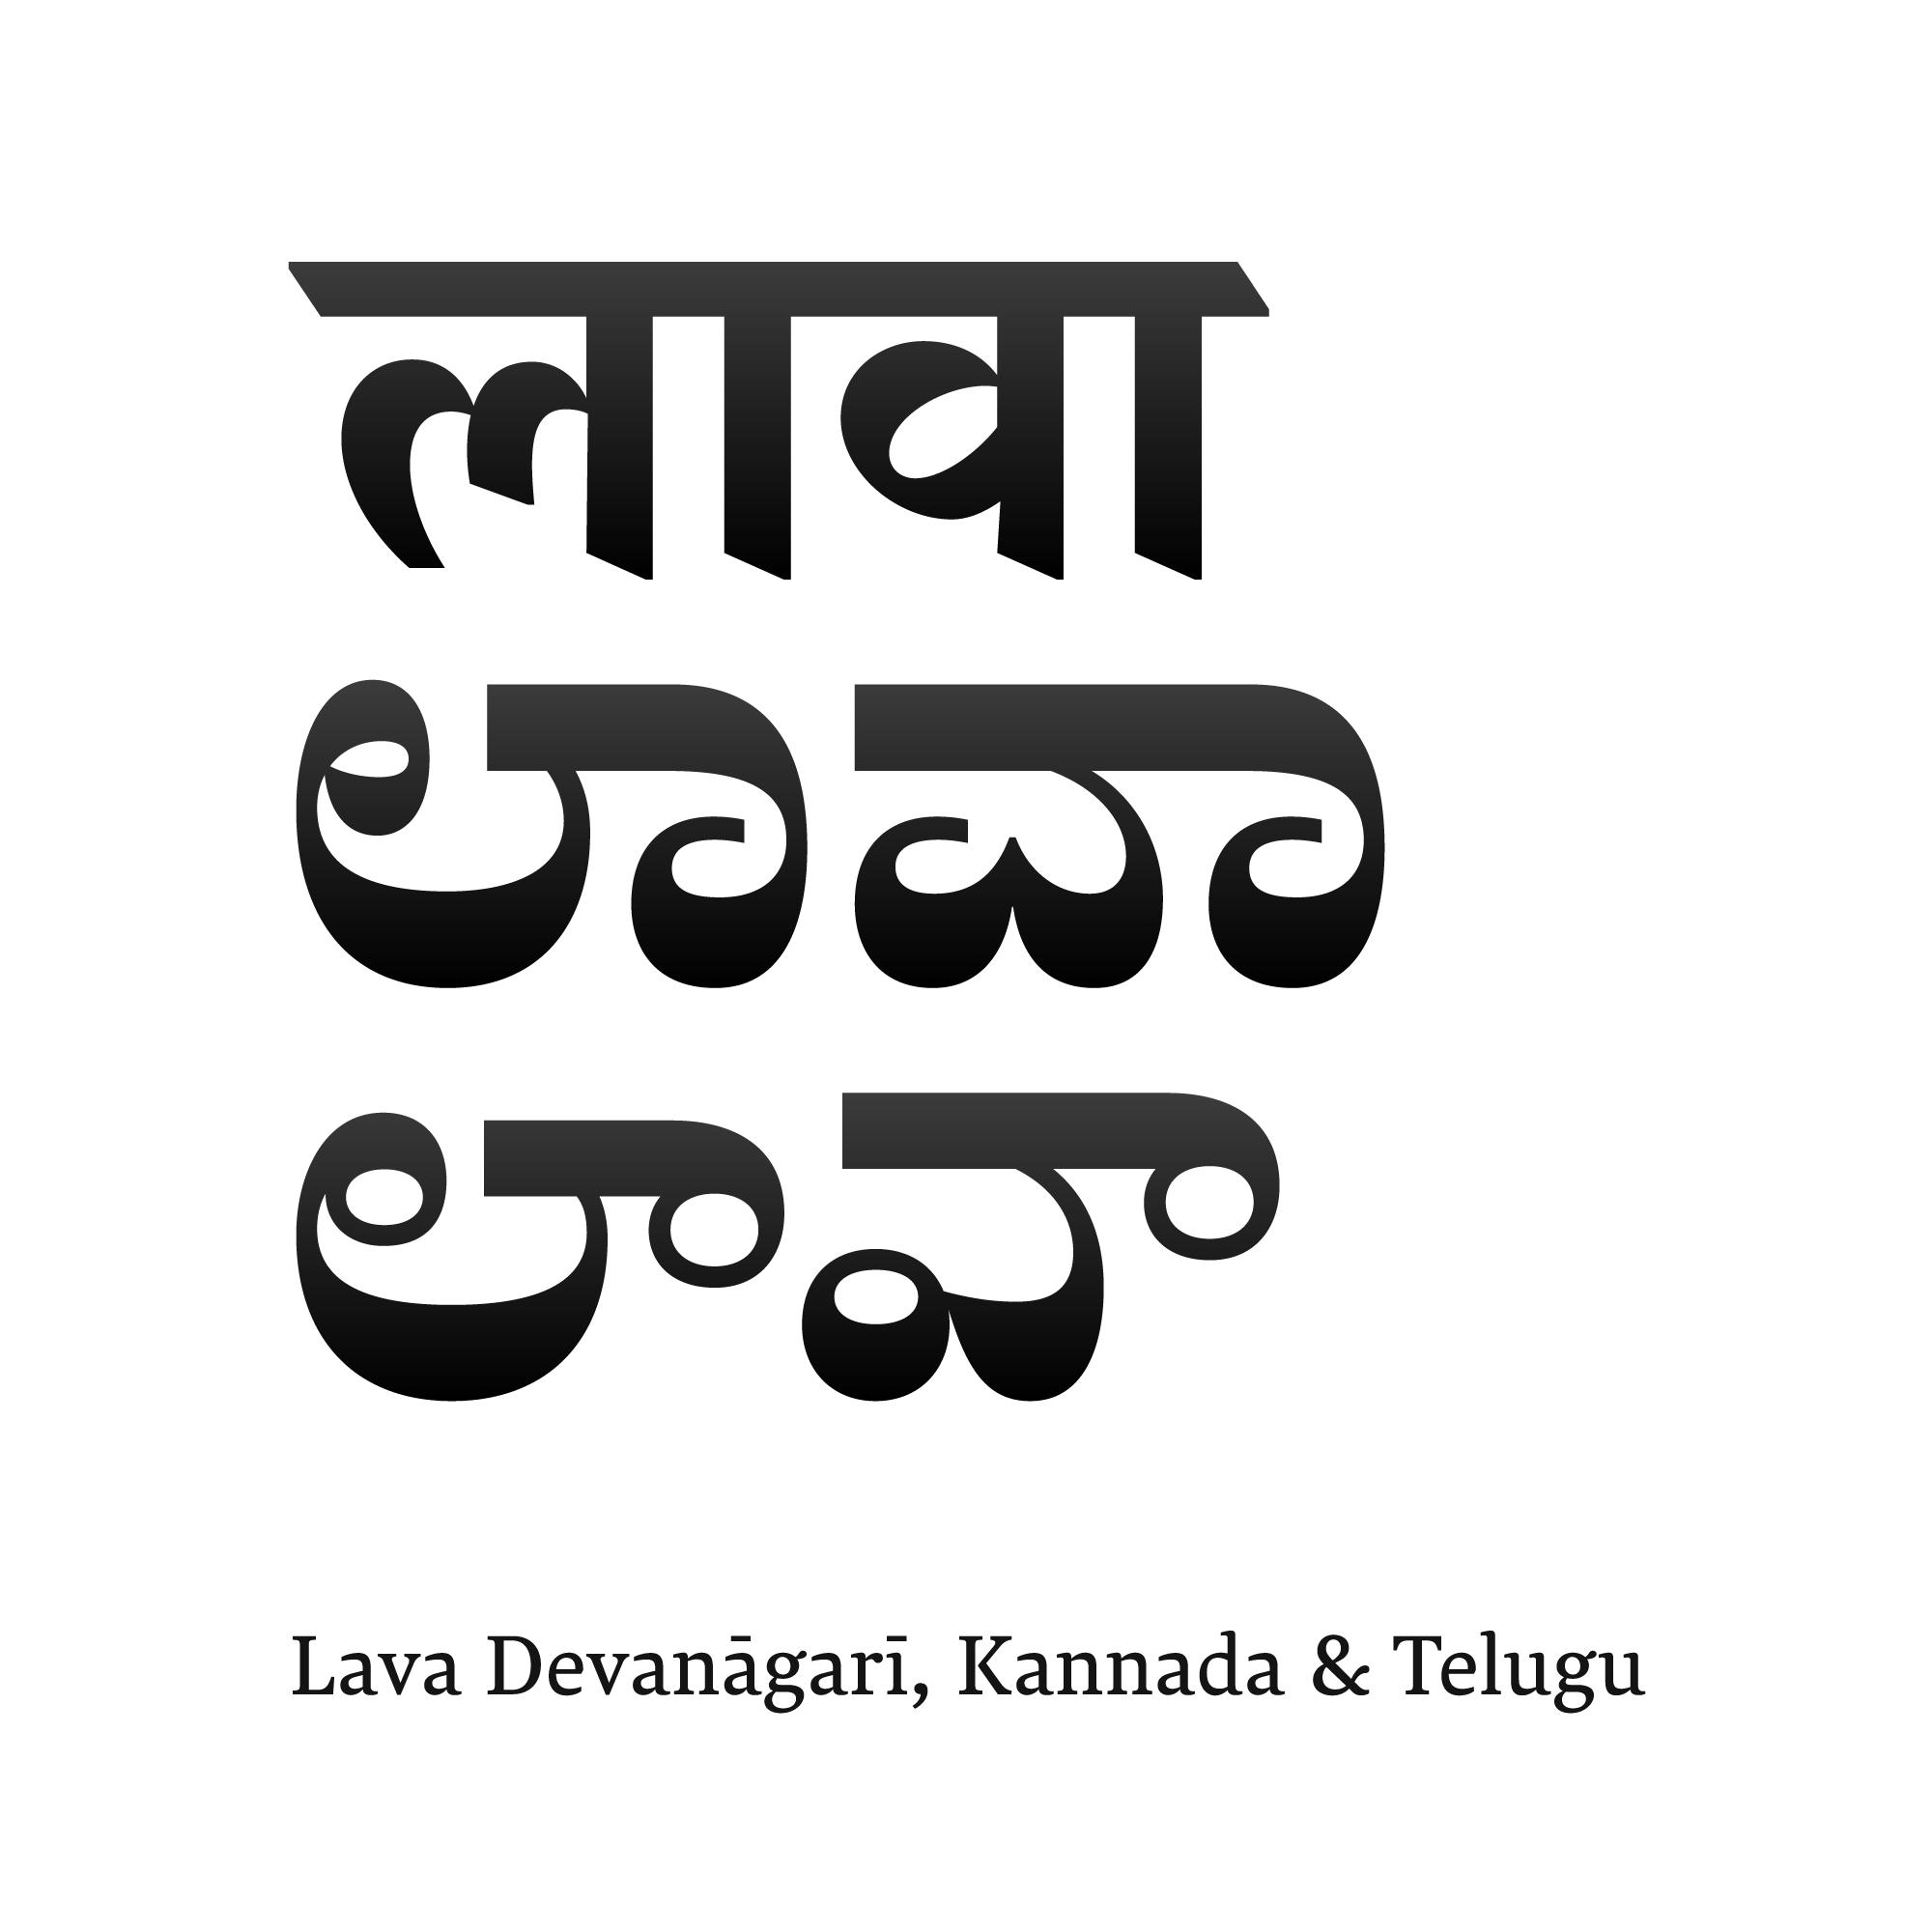 Lava Devanagari, Kannada, Telugu